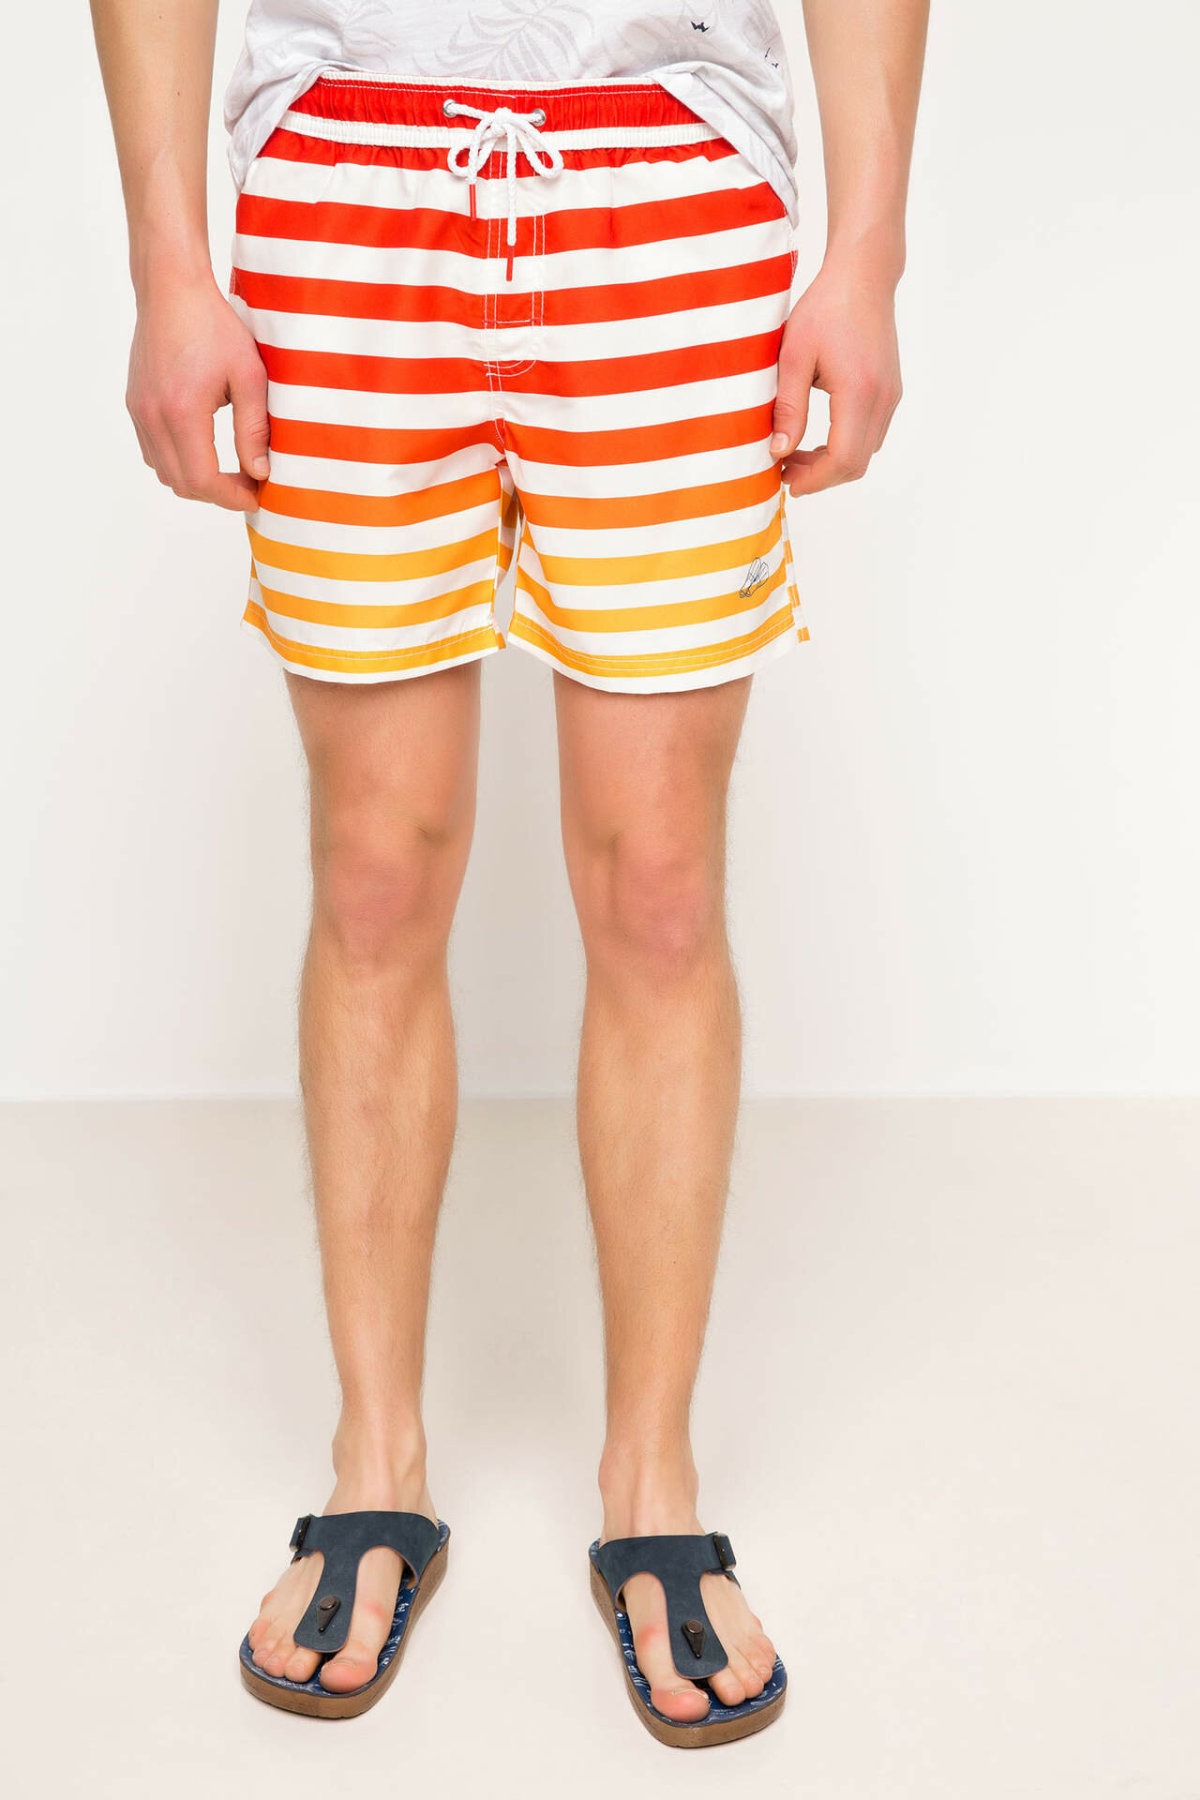 DeFacto Summer Man Woven Swimming Short Male Casual Striped Drawstring Short Pants Men's Loose Swim Bottoms - G7333AZ17HS